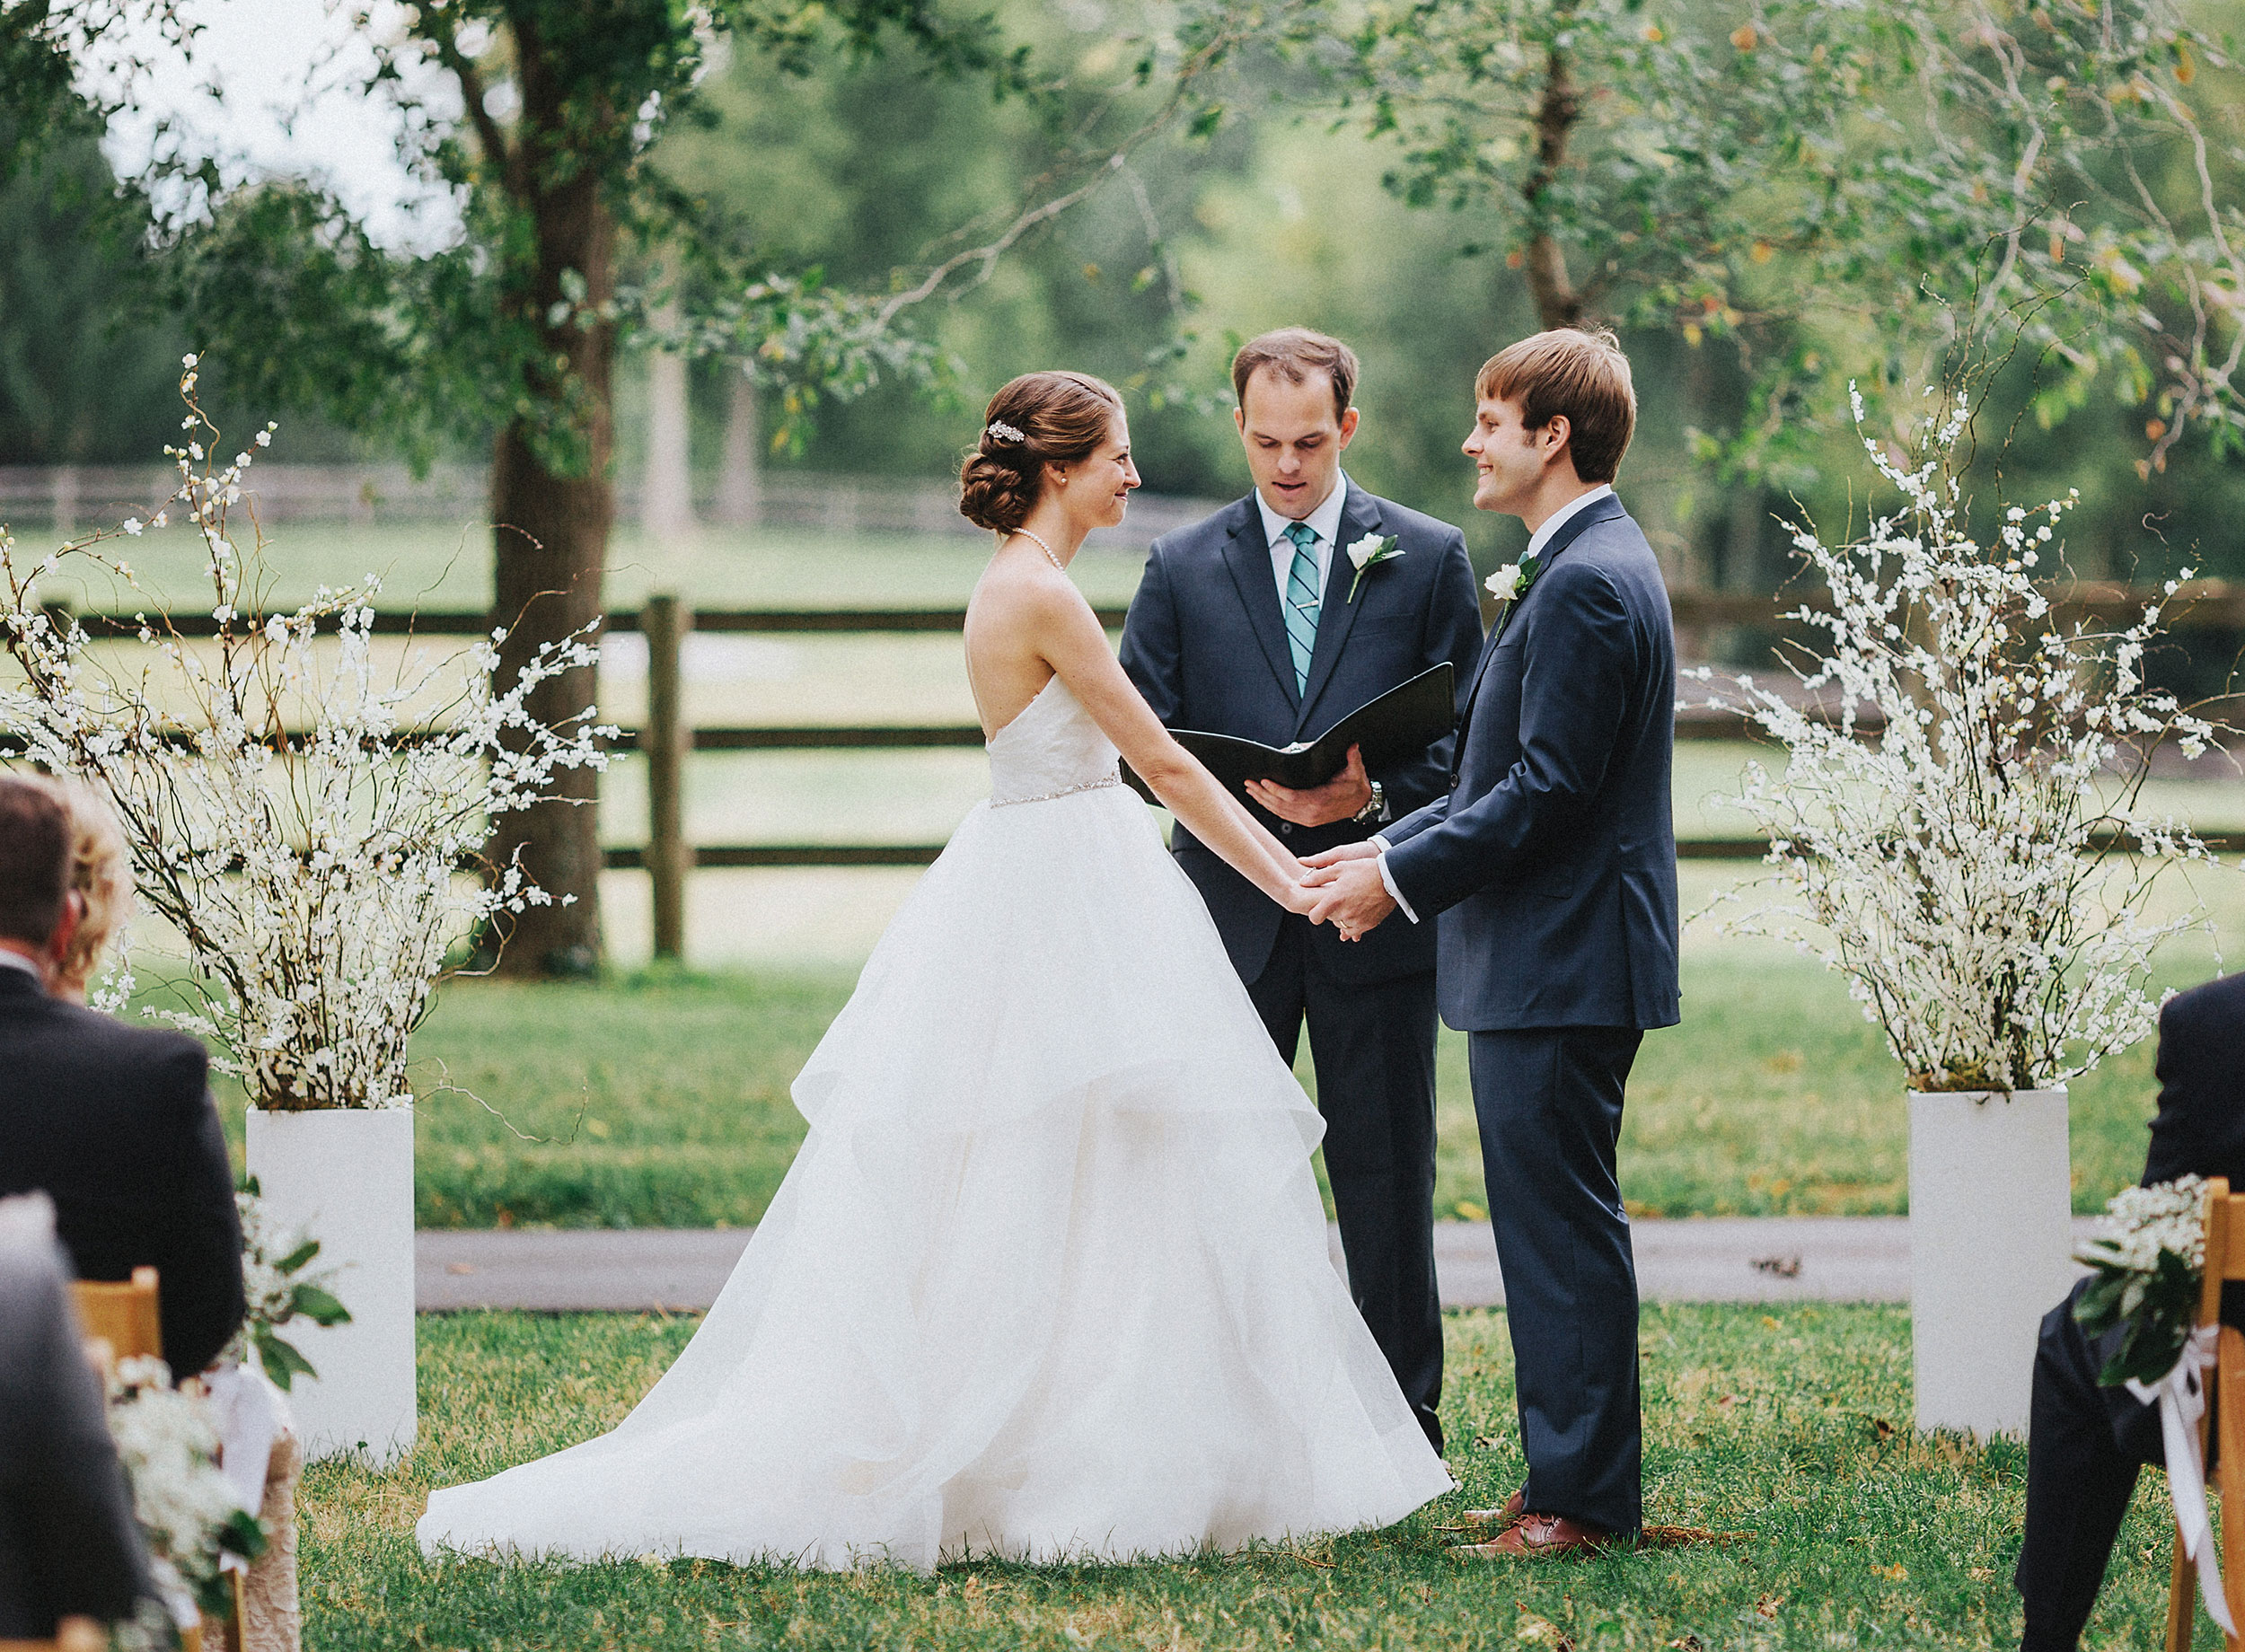 saxony-farm-wedding-photographer-15.JPG